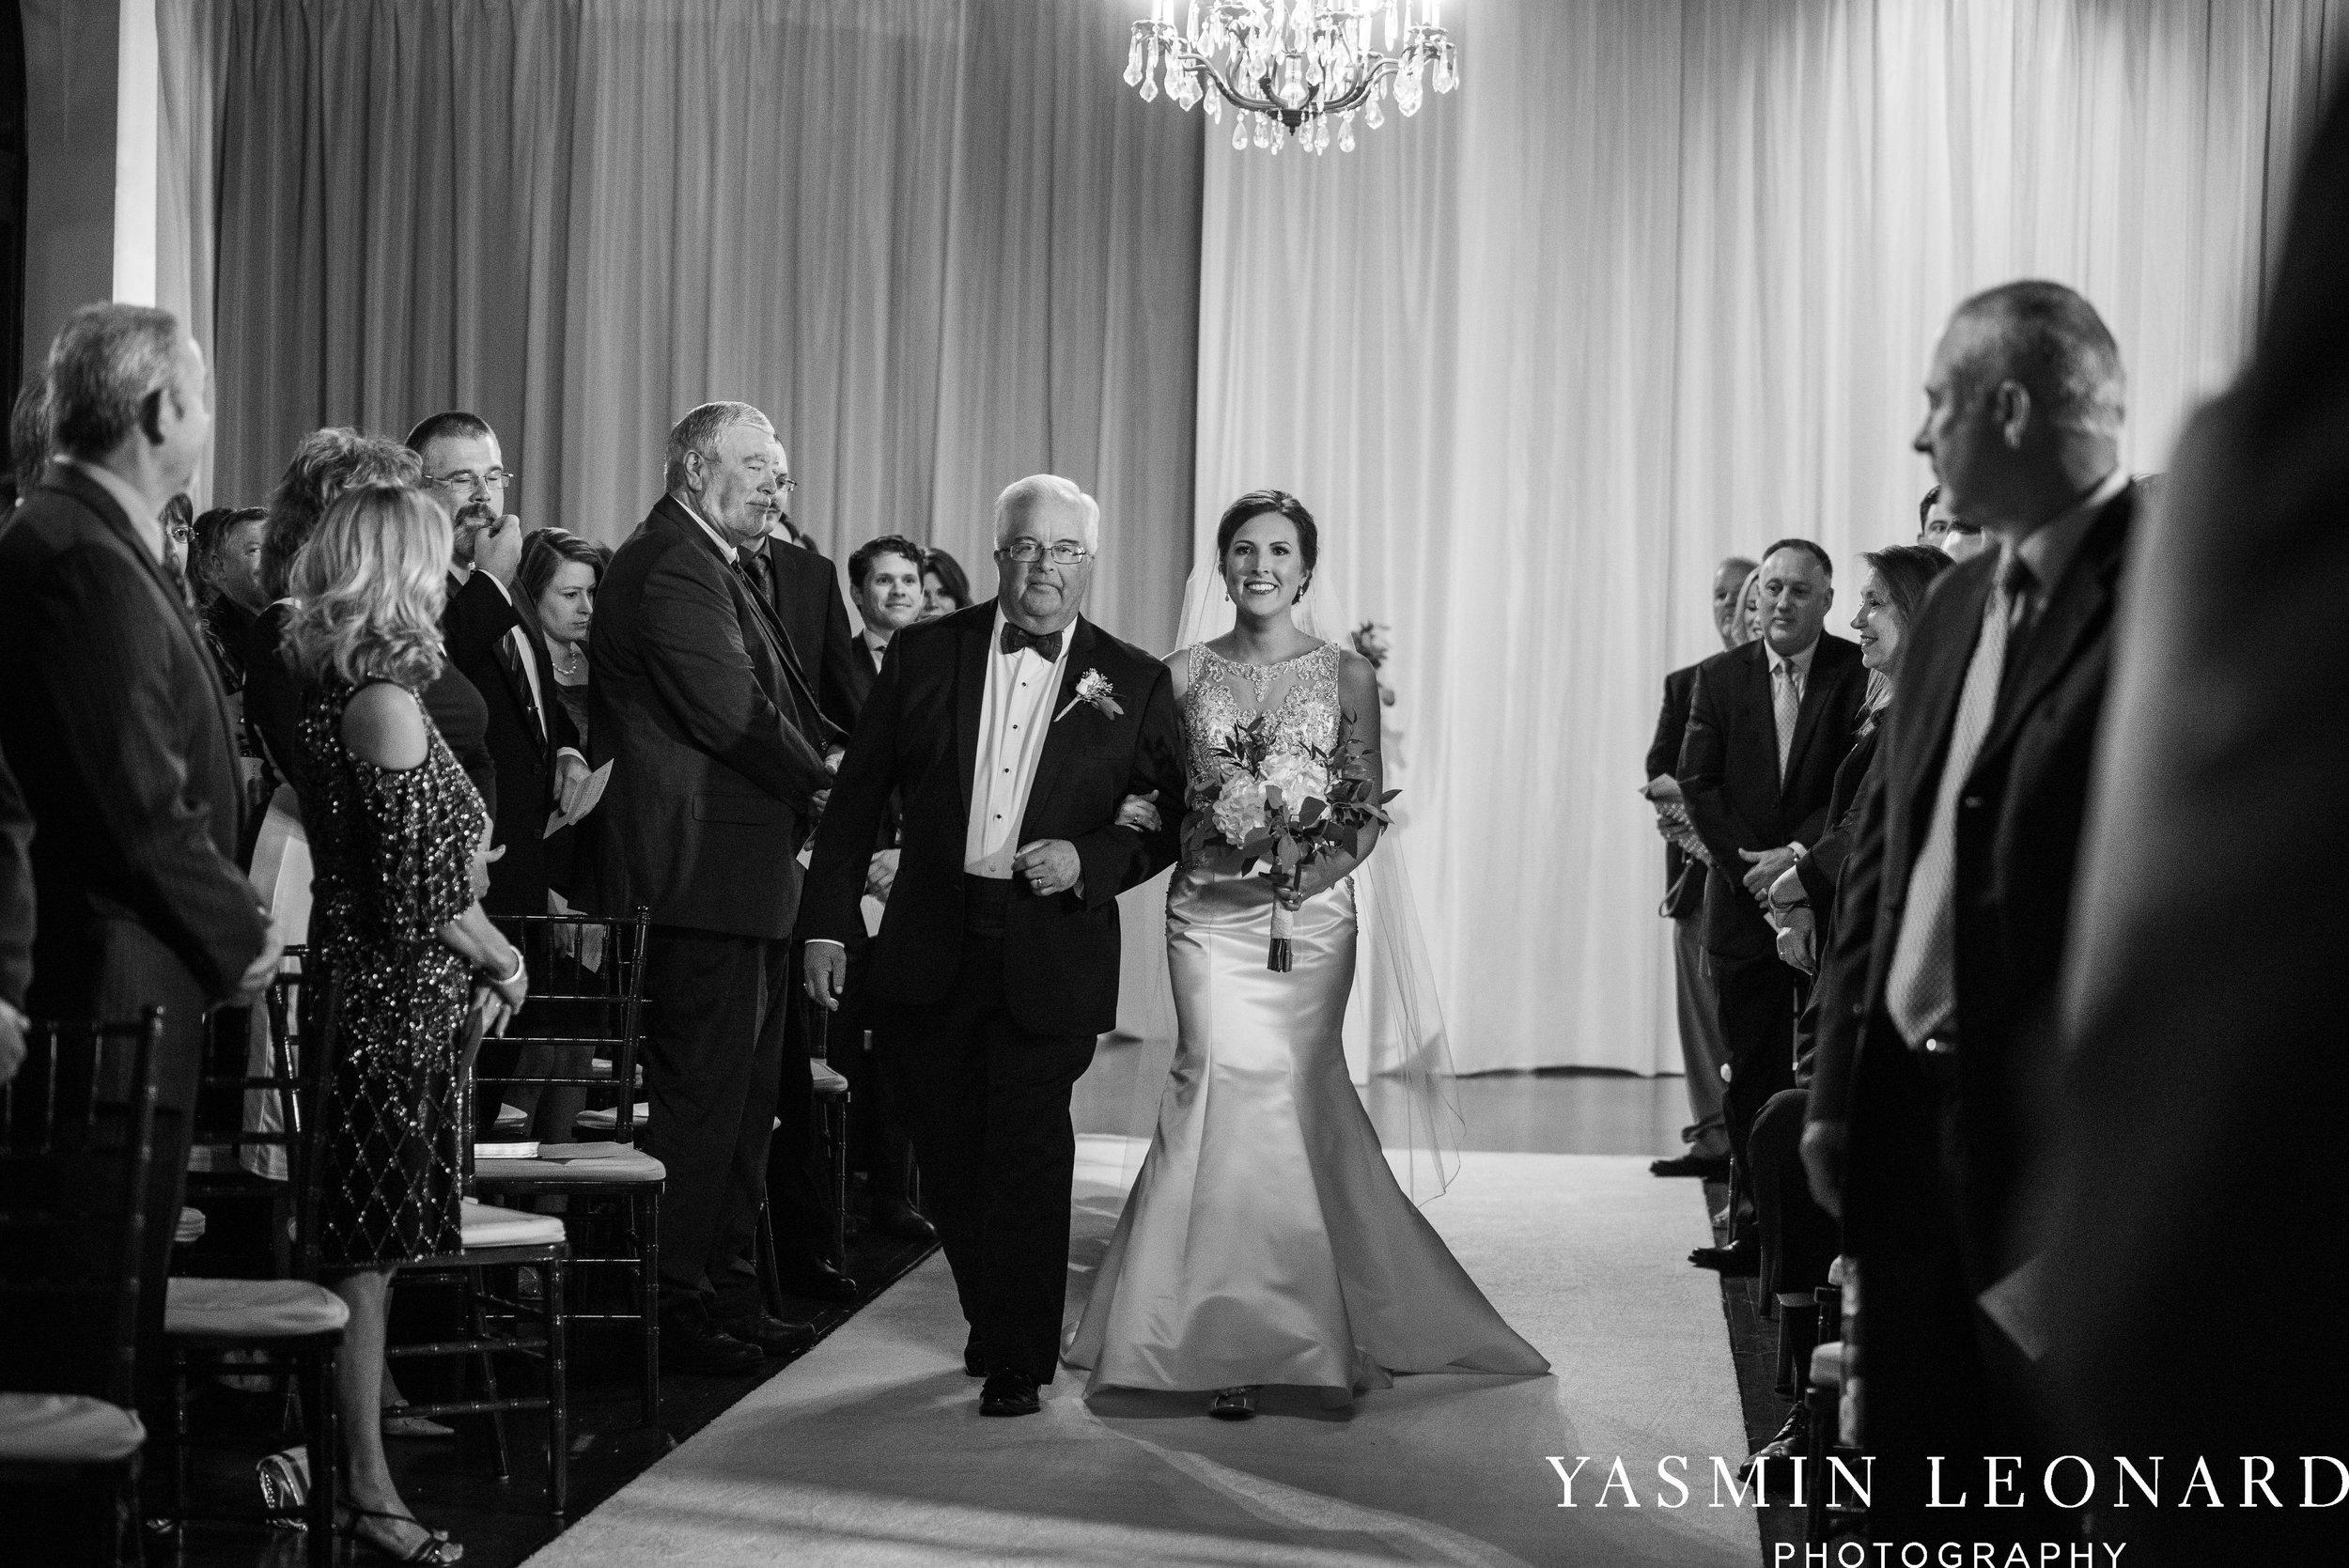 Millennium Center Wedding - Downtown Winston Salem - Winston Salem Wedding Photographer - Winston Salem Venues - Indoor Wedding Venues - NC Wedding Photographer - Yasmin Leonard Photography-37.jpg